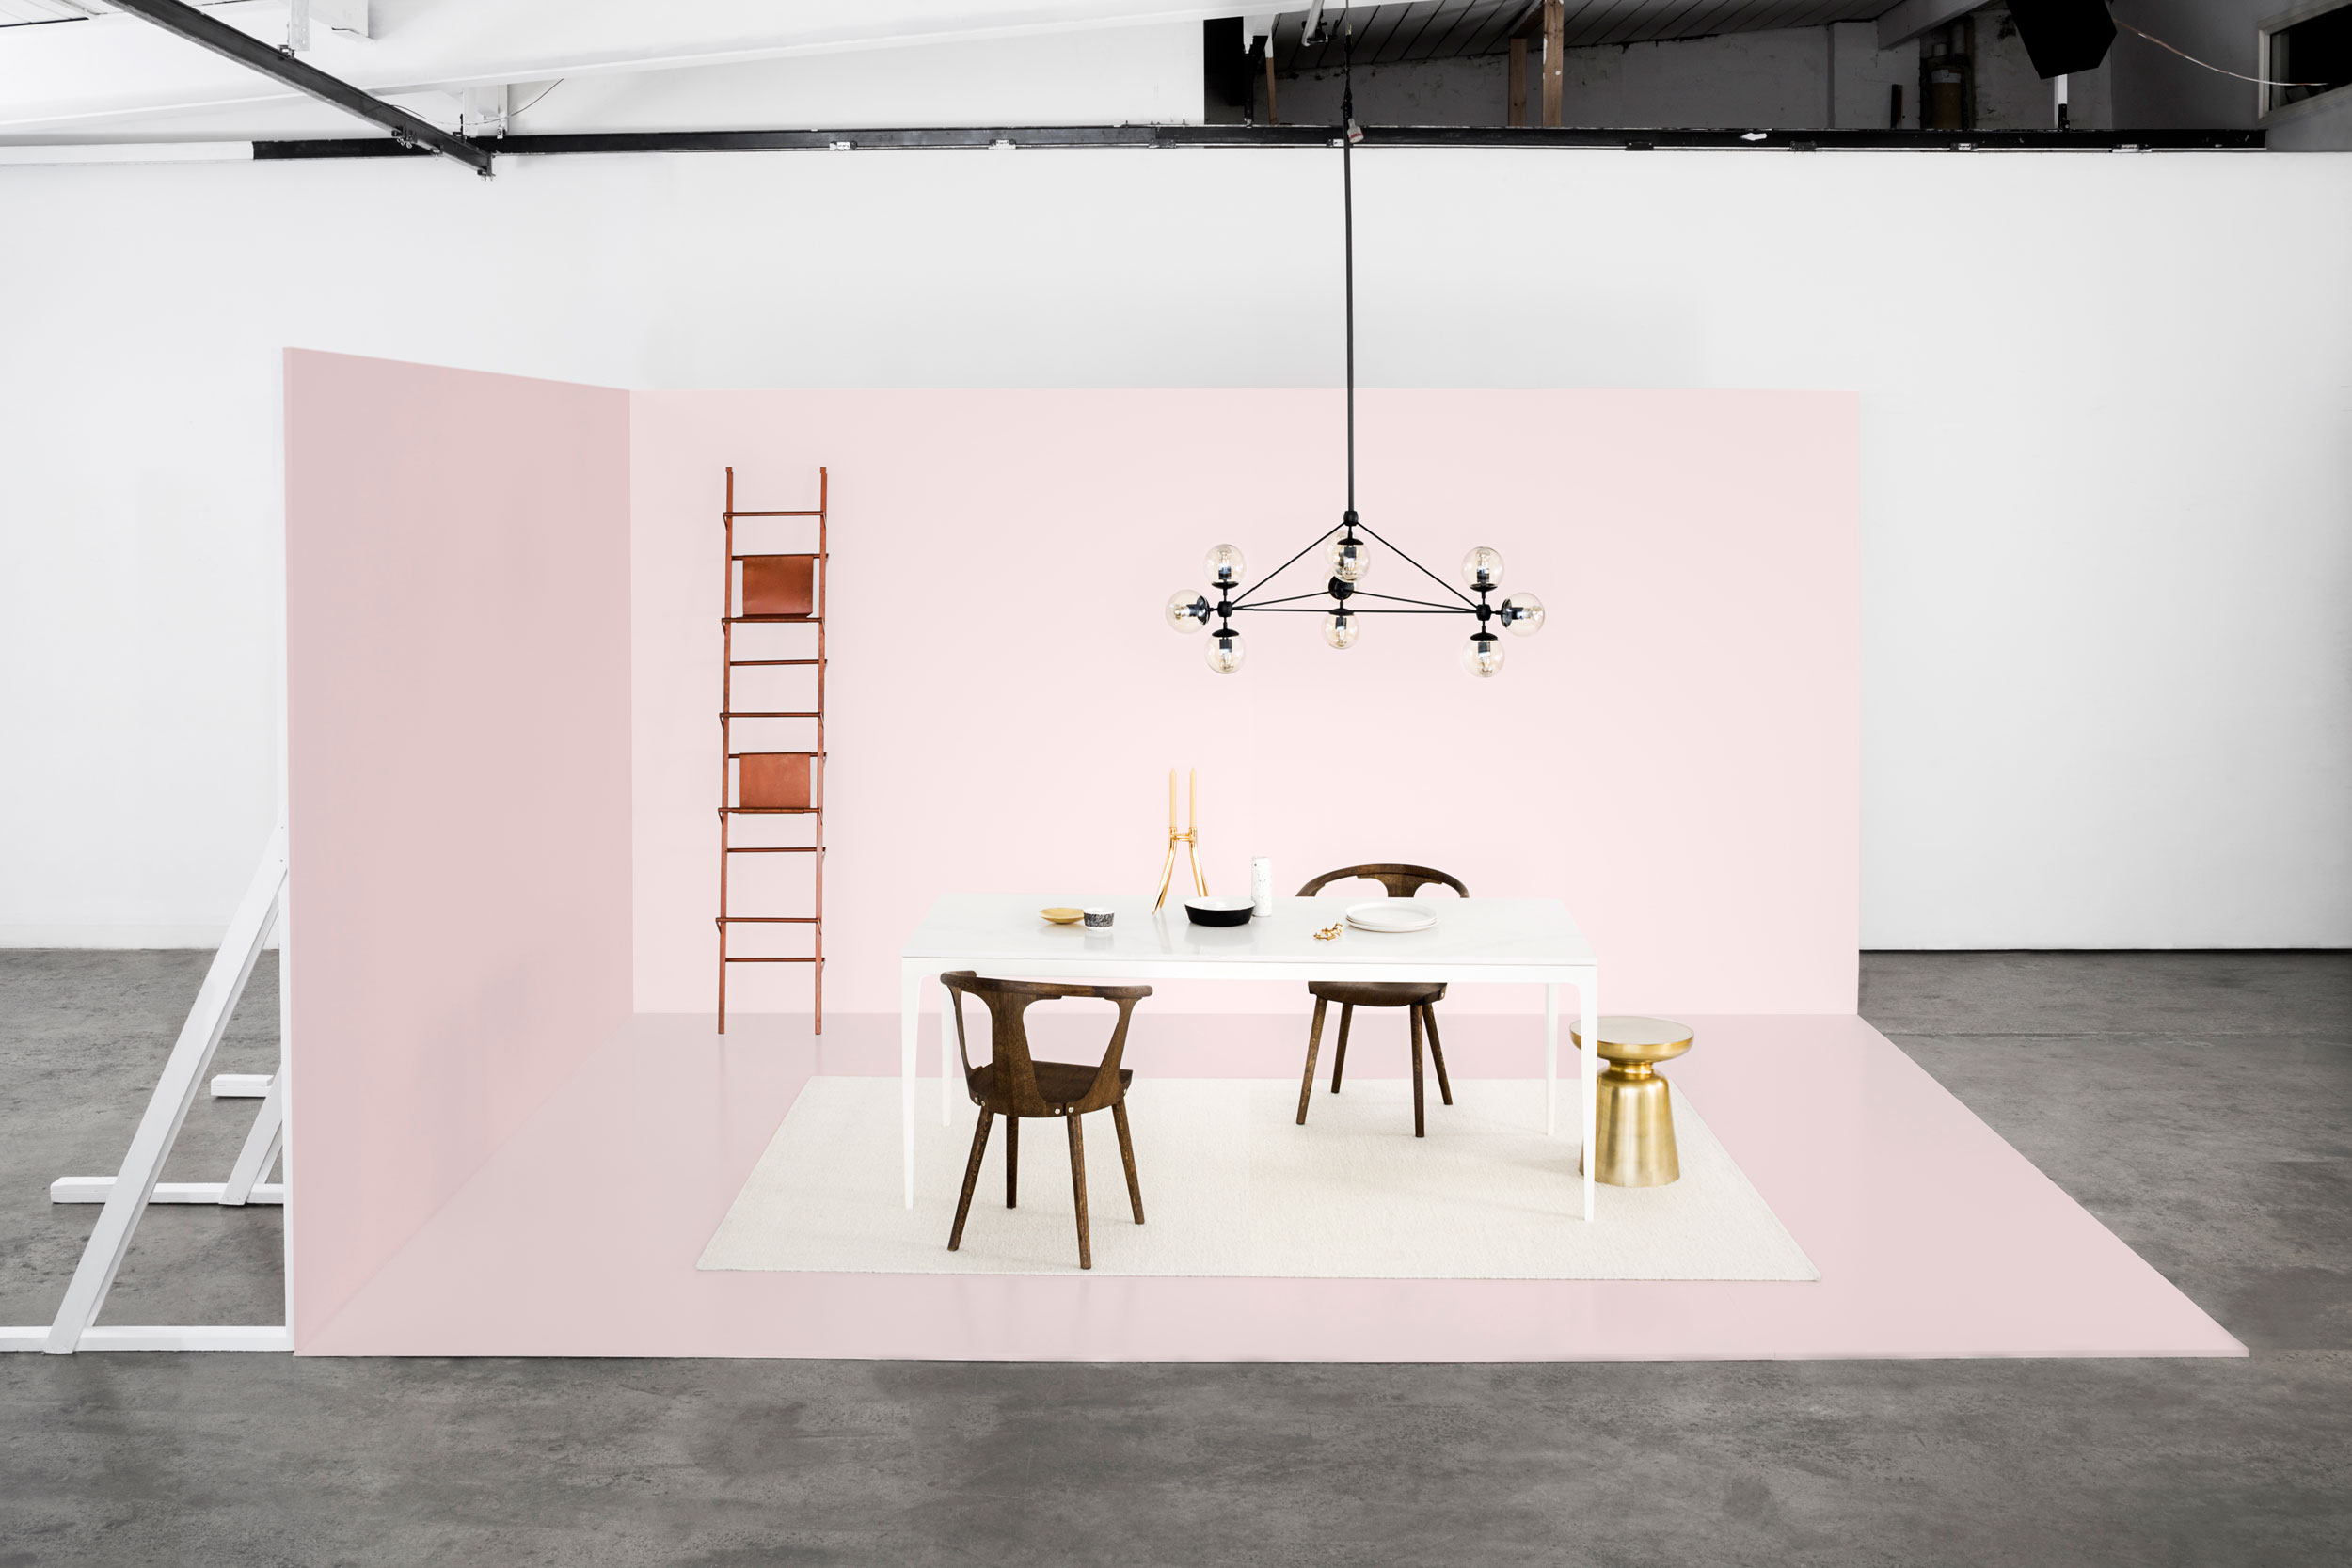 Urbi_table_stone_calcutta_cesarstone_pink_sarah_anderson_photography